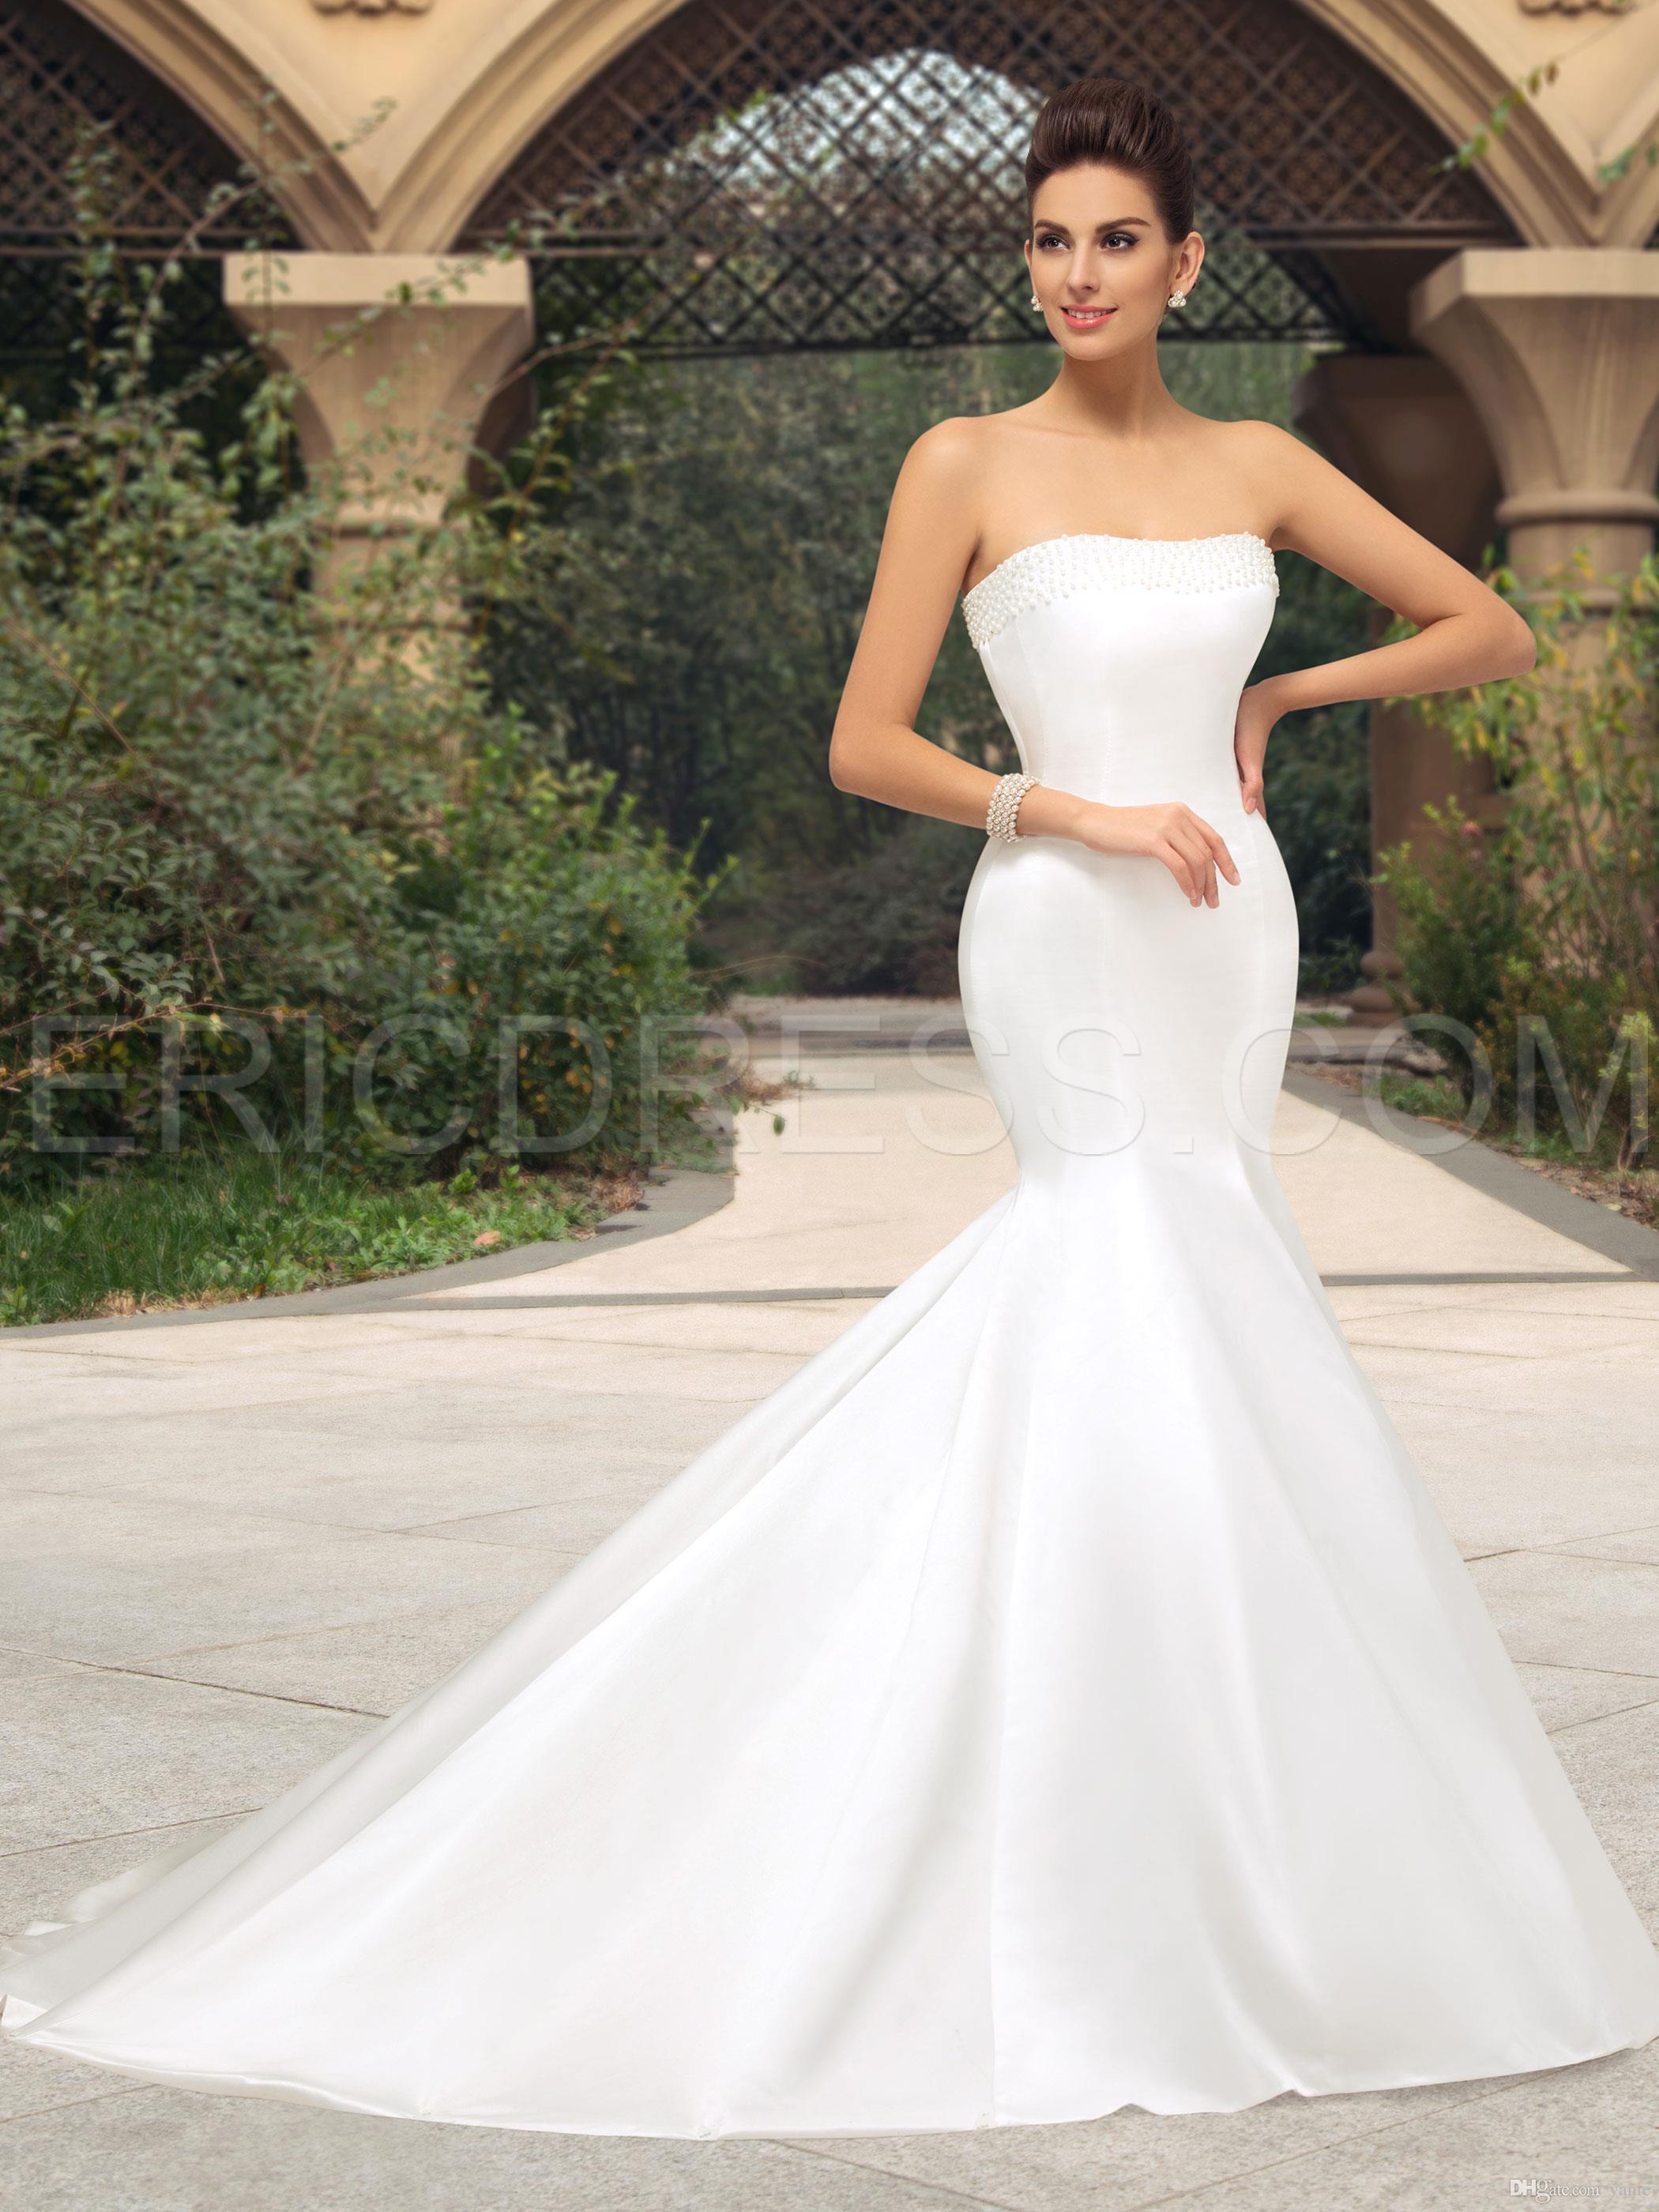 Nwd27 2017 Fashionable Of Bride Simple Satin Mermaid Wedding Dress ...